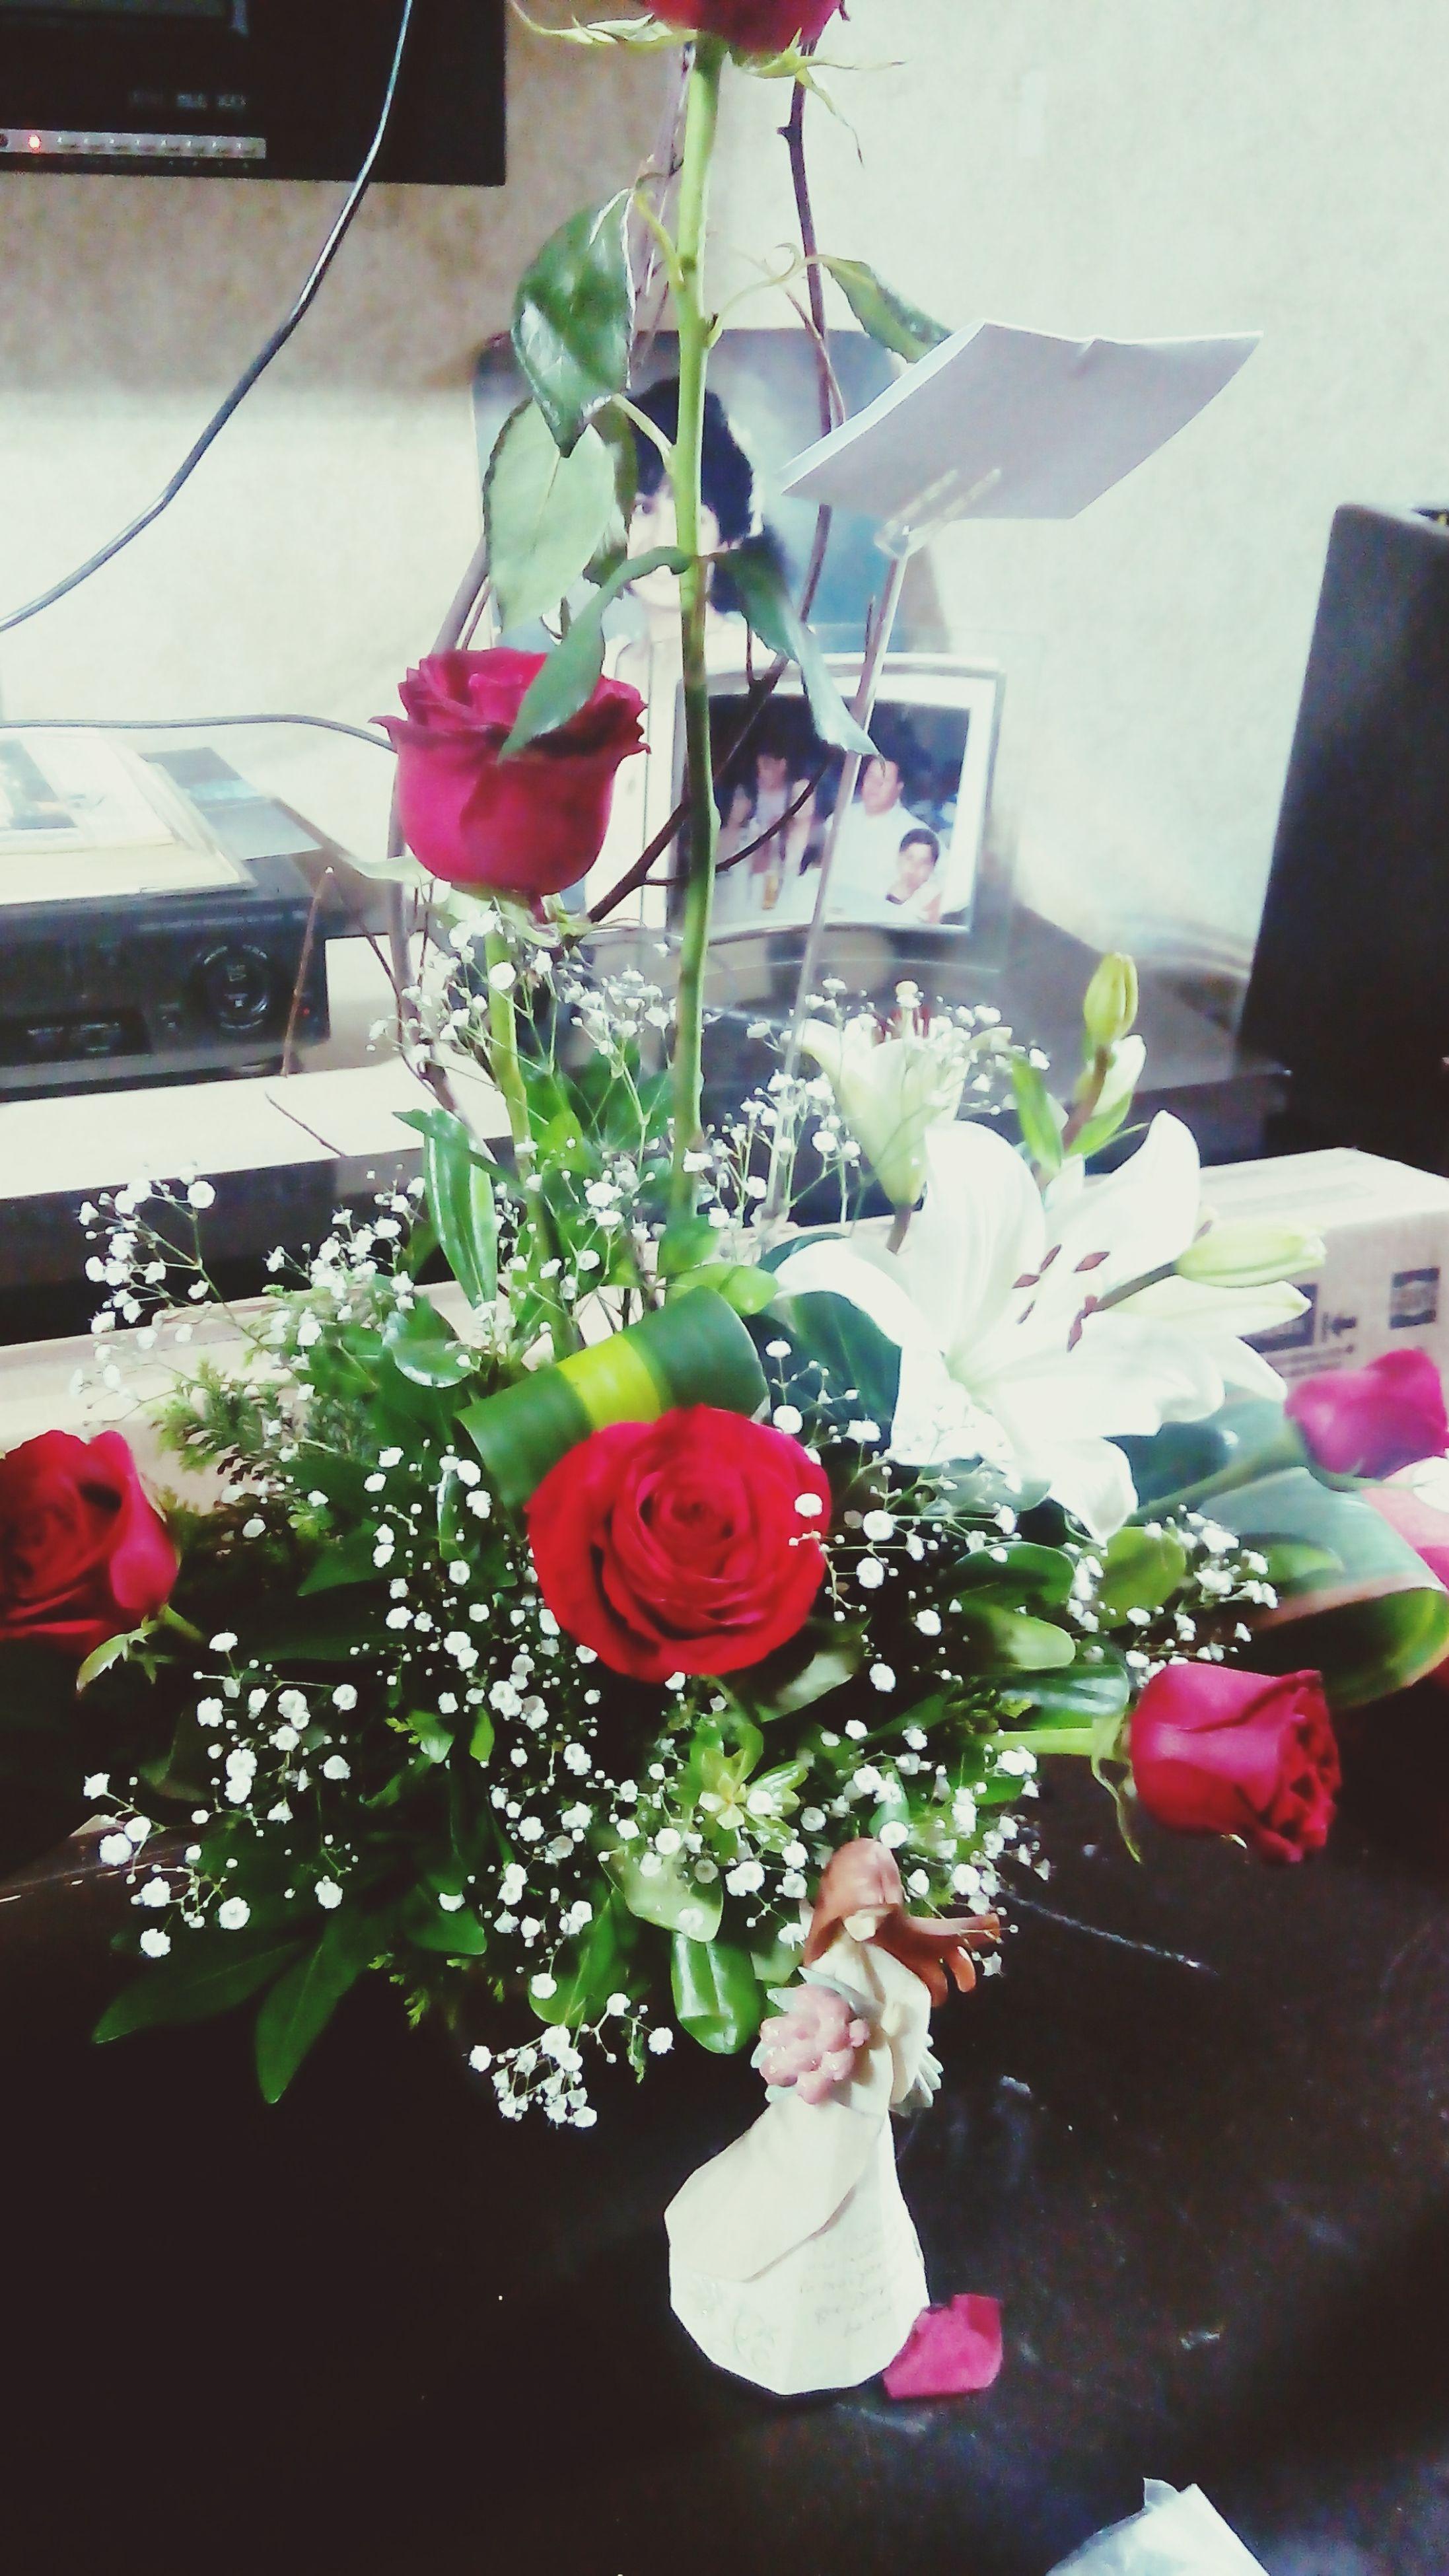 flower, indoors, petal, fragility, freshness, vase, decoration, table, flower head, rose - flower, potted plant, pink color, home interior, plant, bouquet, flower pot, flower arrangement, growth, bunch of flowers, close-up